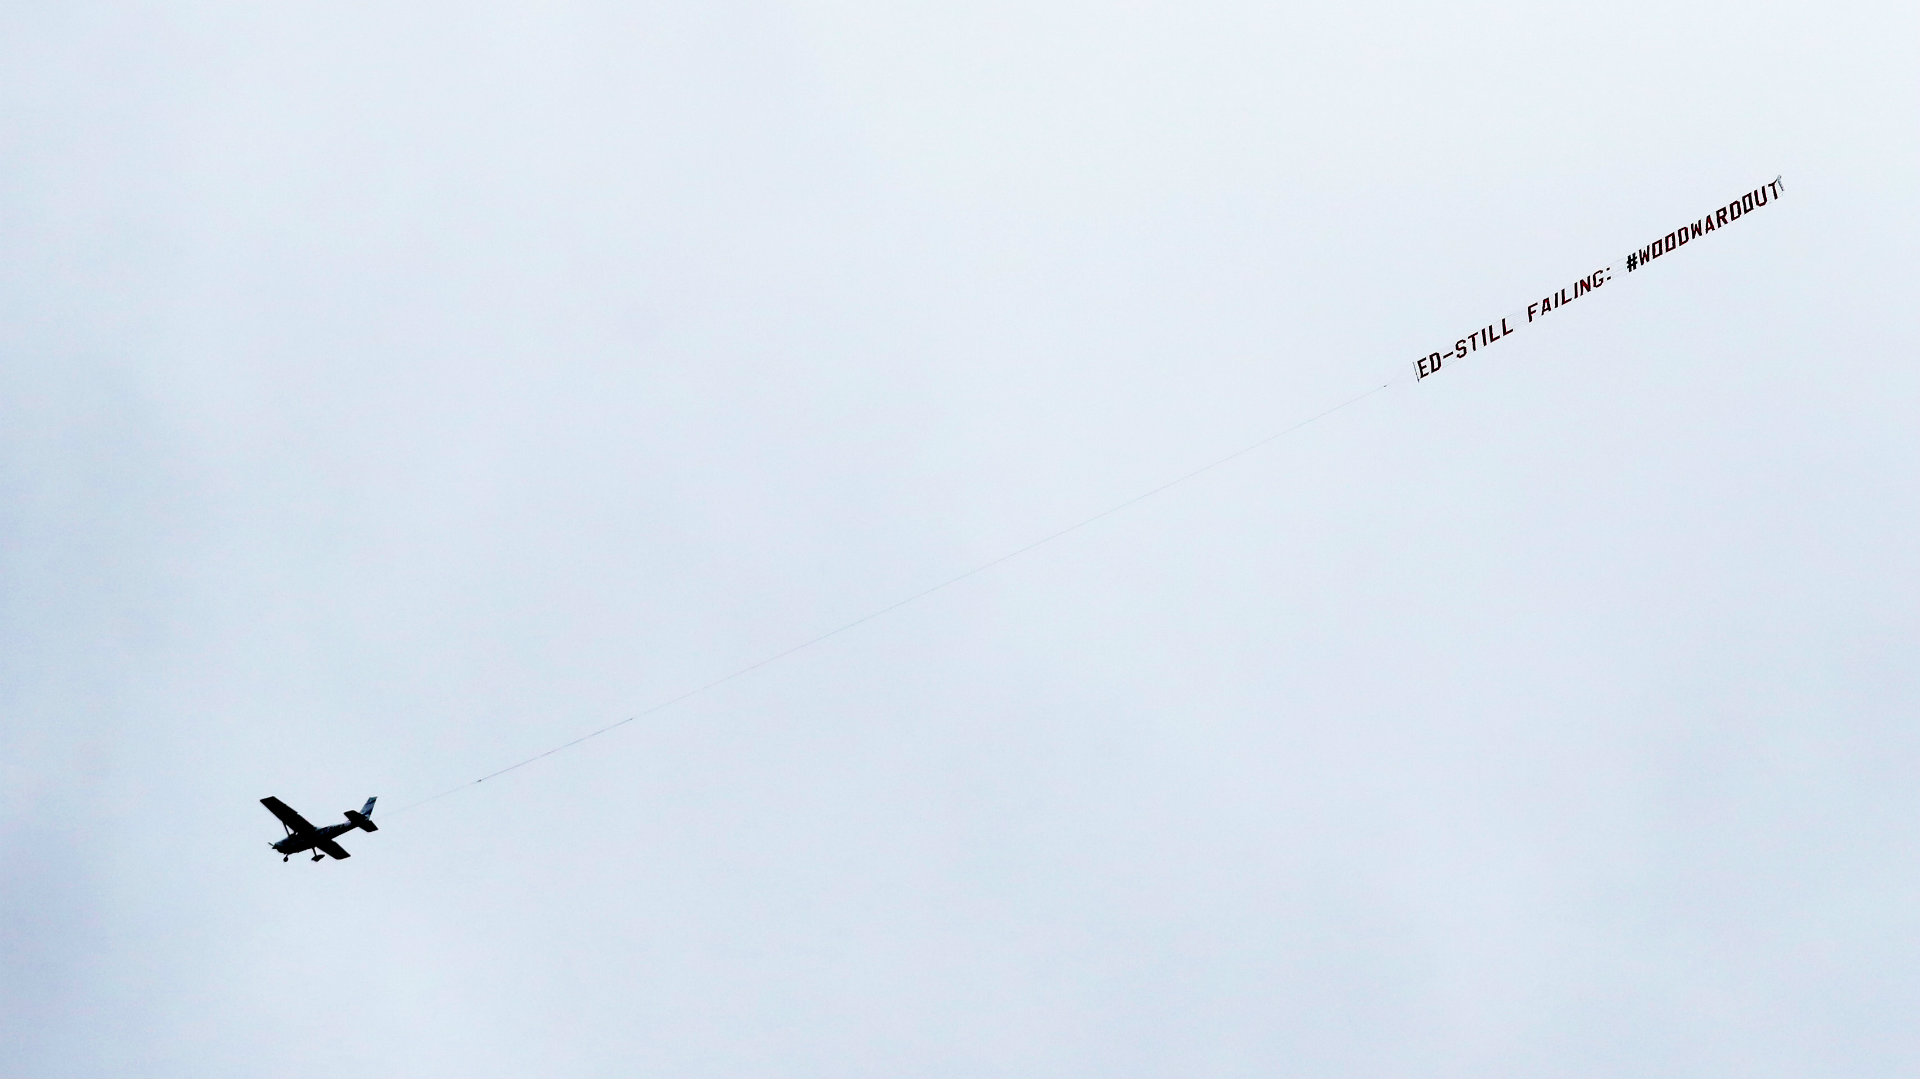 Ed Woodward plane protest Man Utd vs Liverpool 2019-20